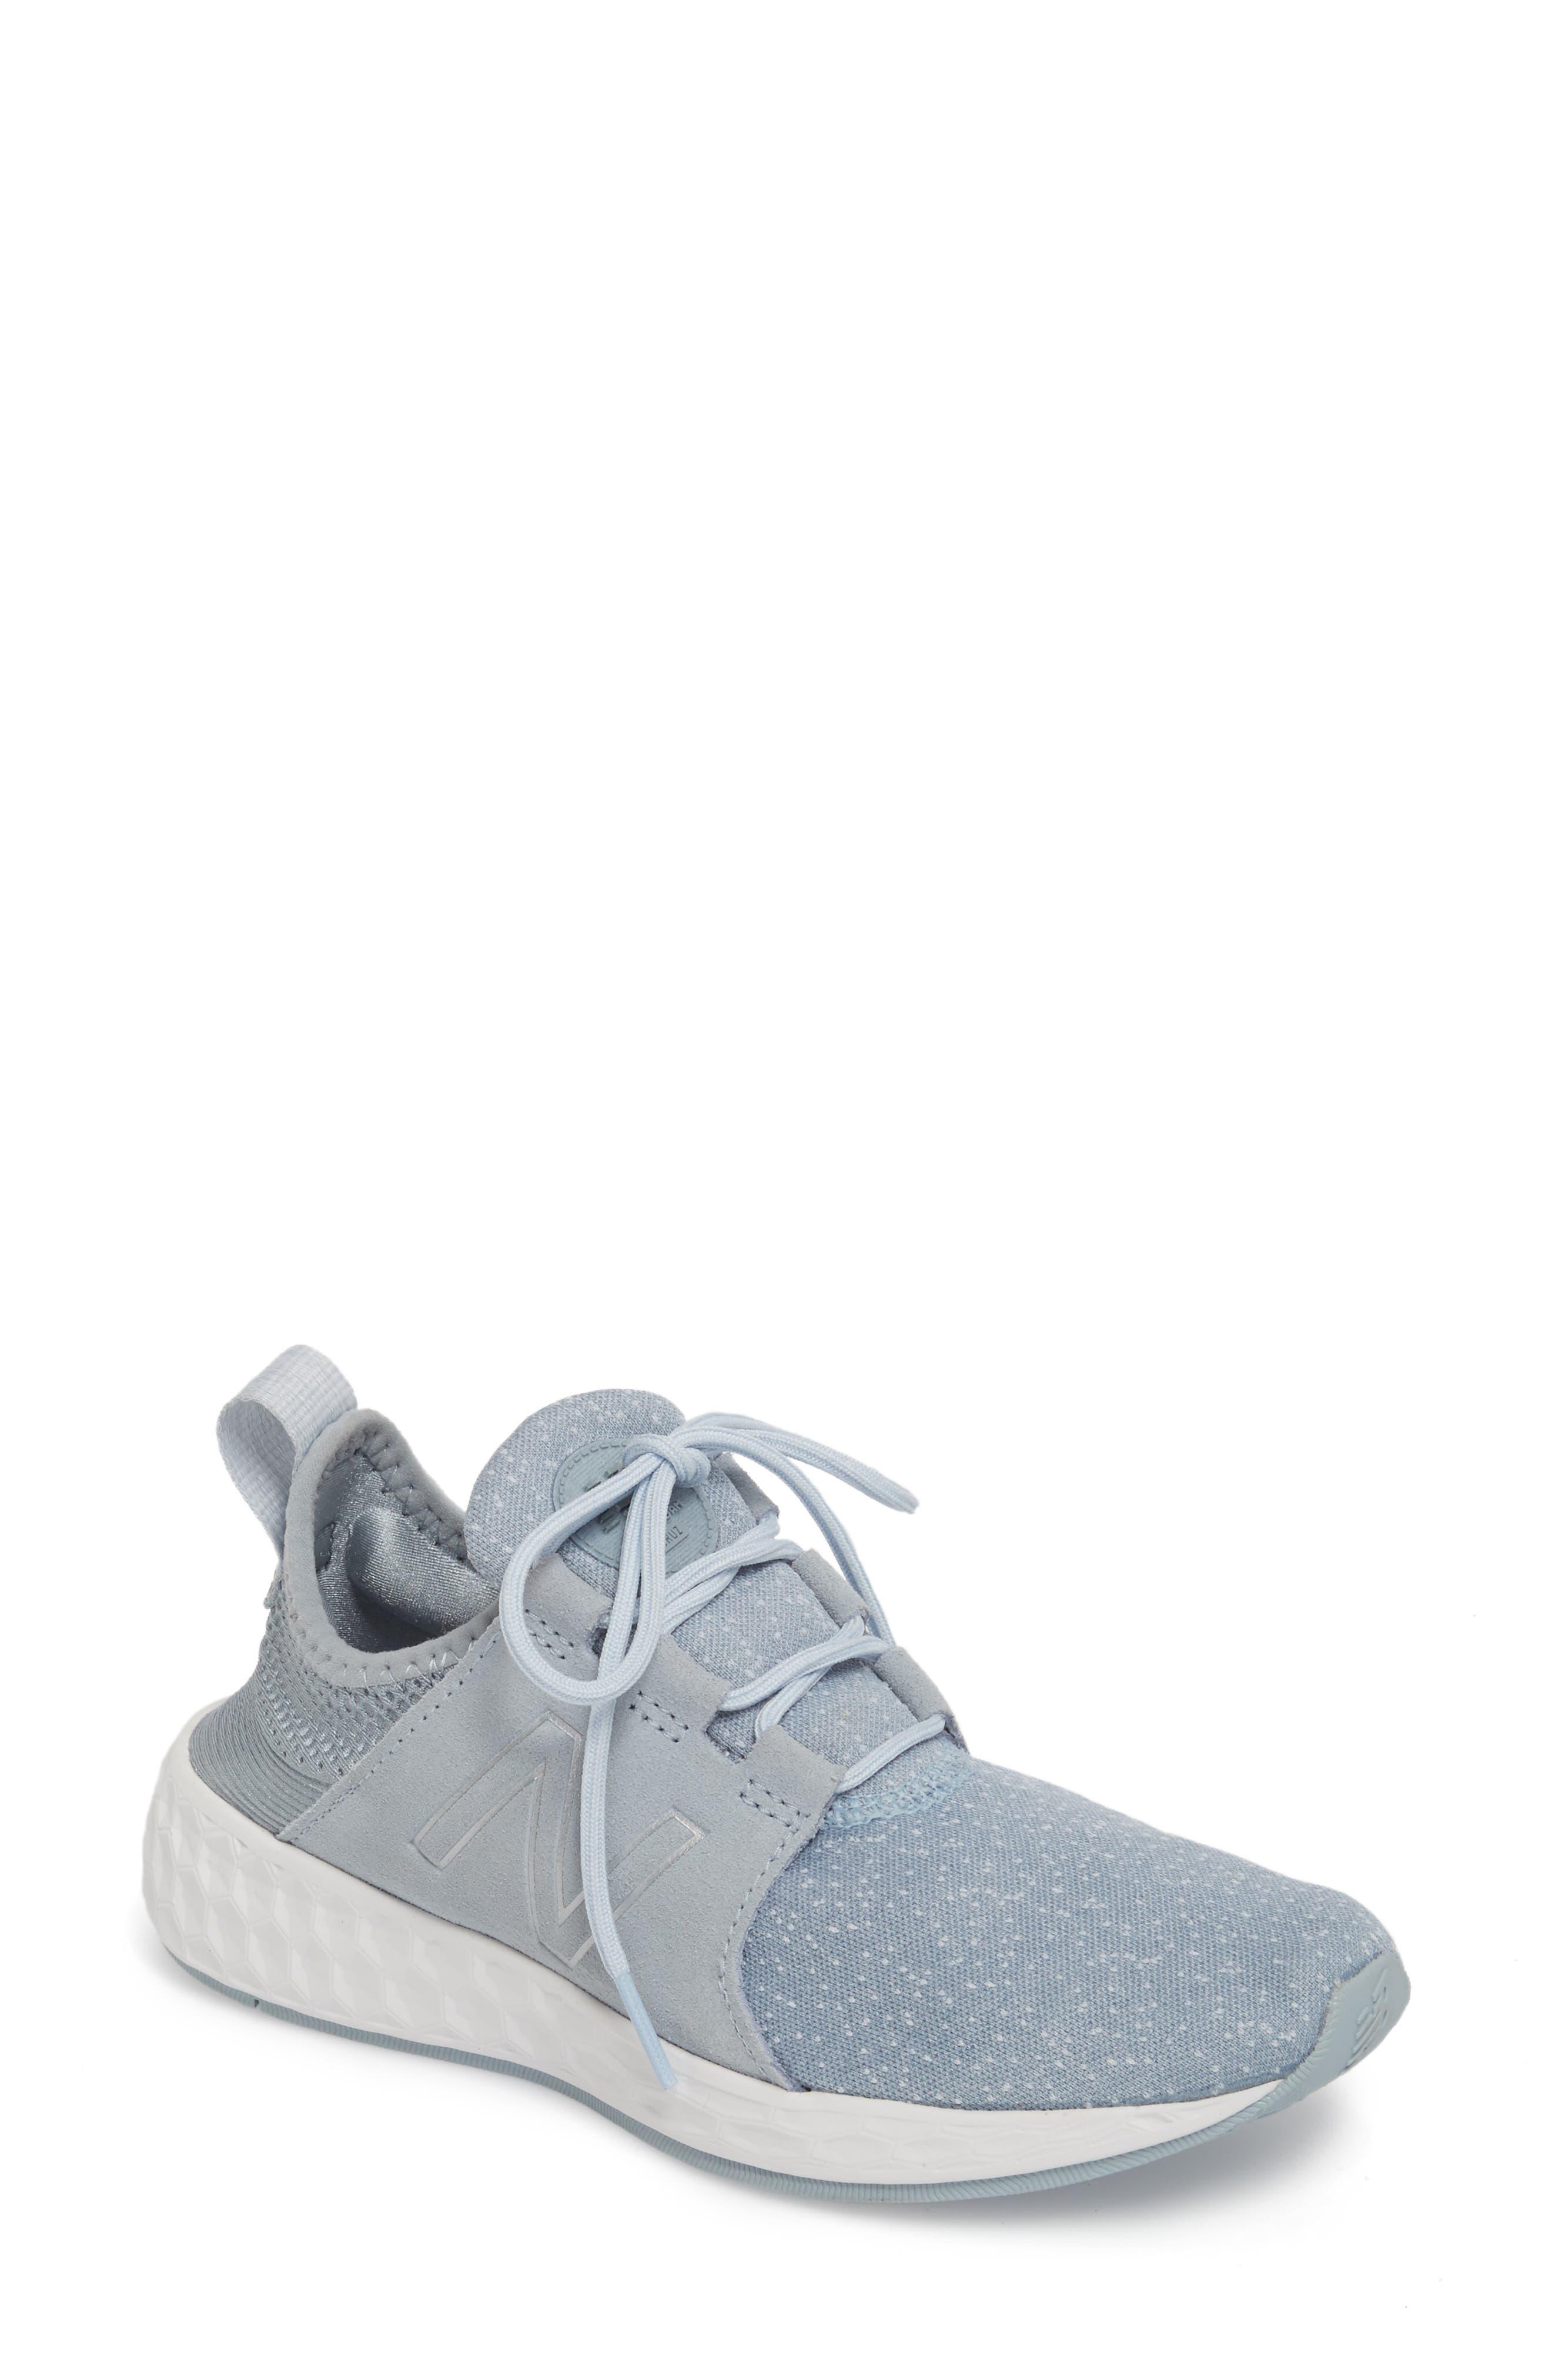 New Balance Fresh Foam Cruz Running Shoe (Women)